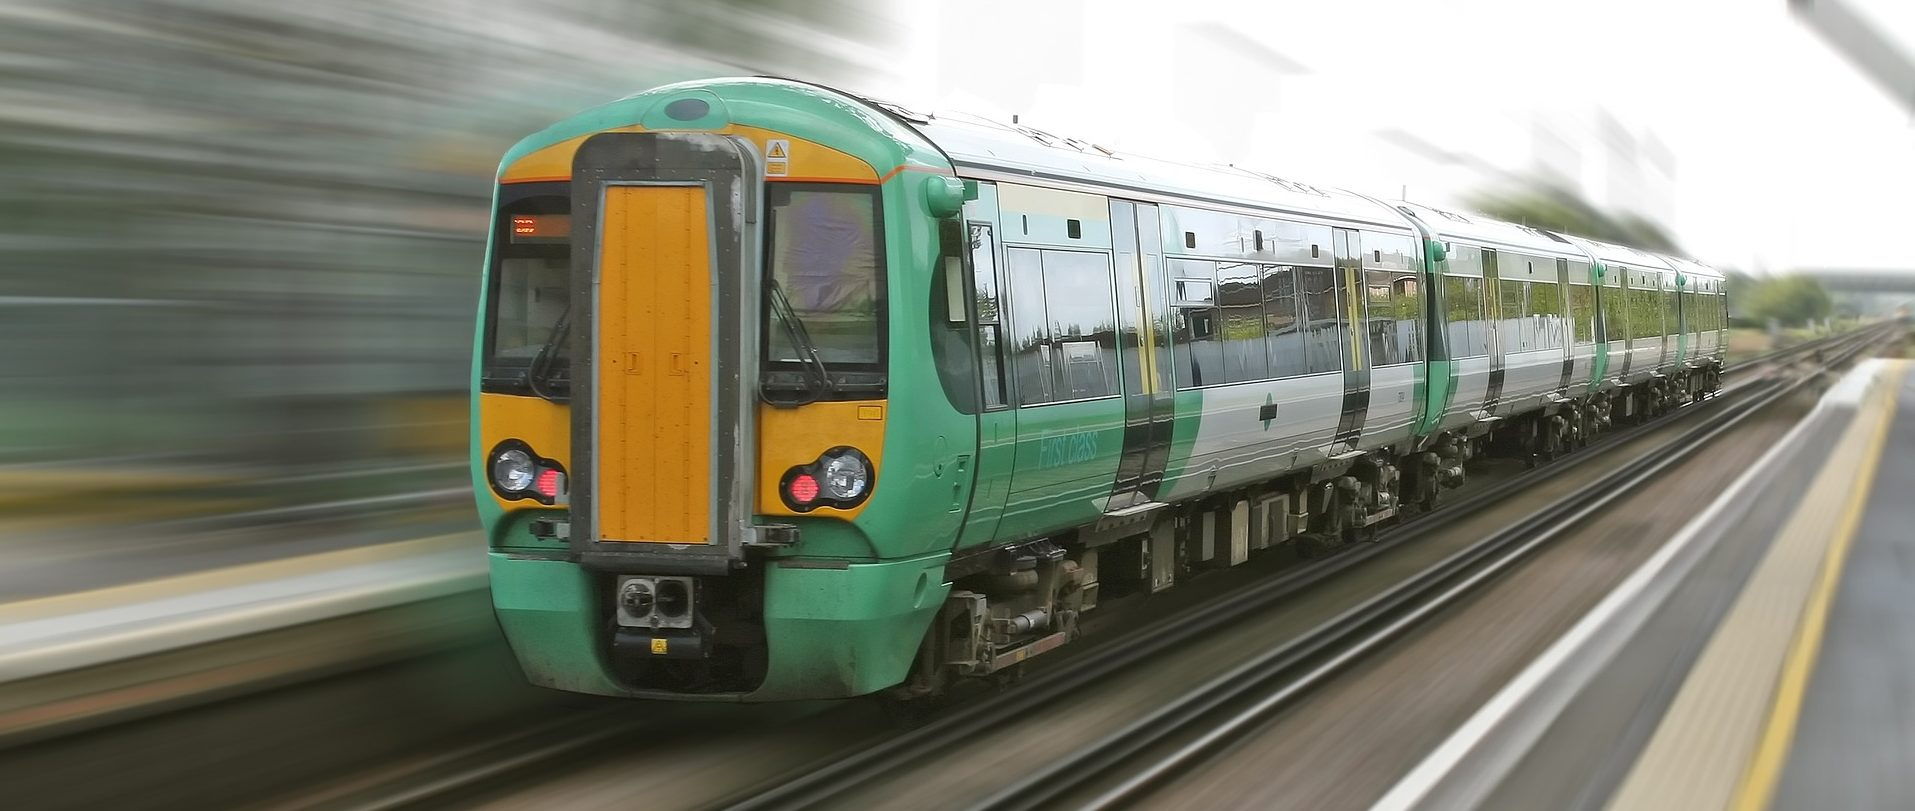 A train speeding along a track